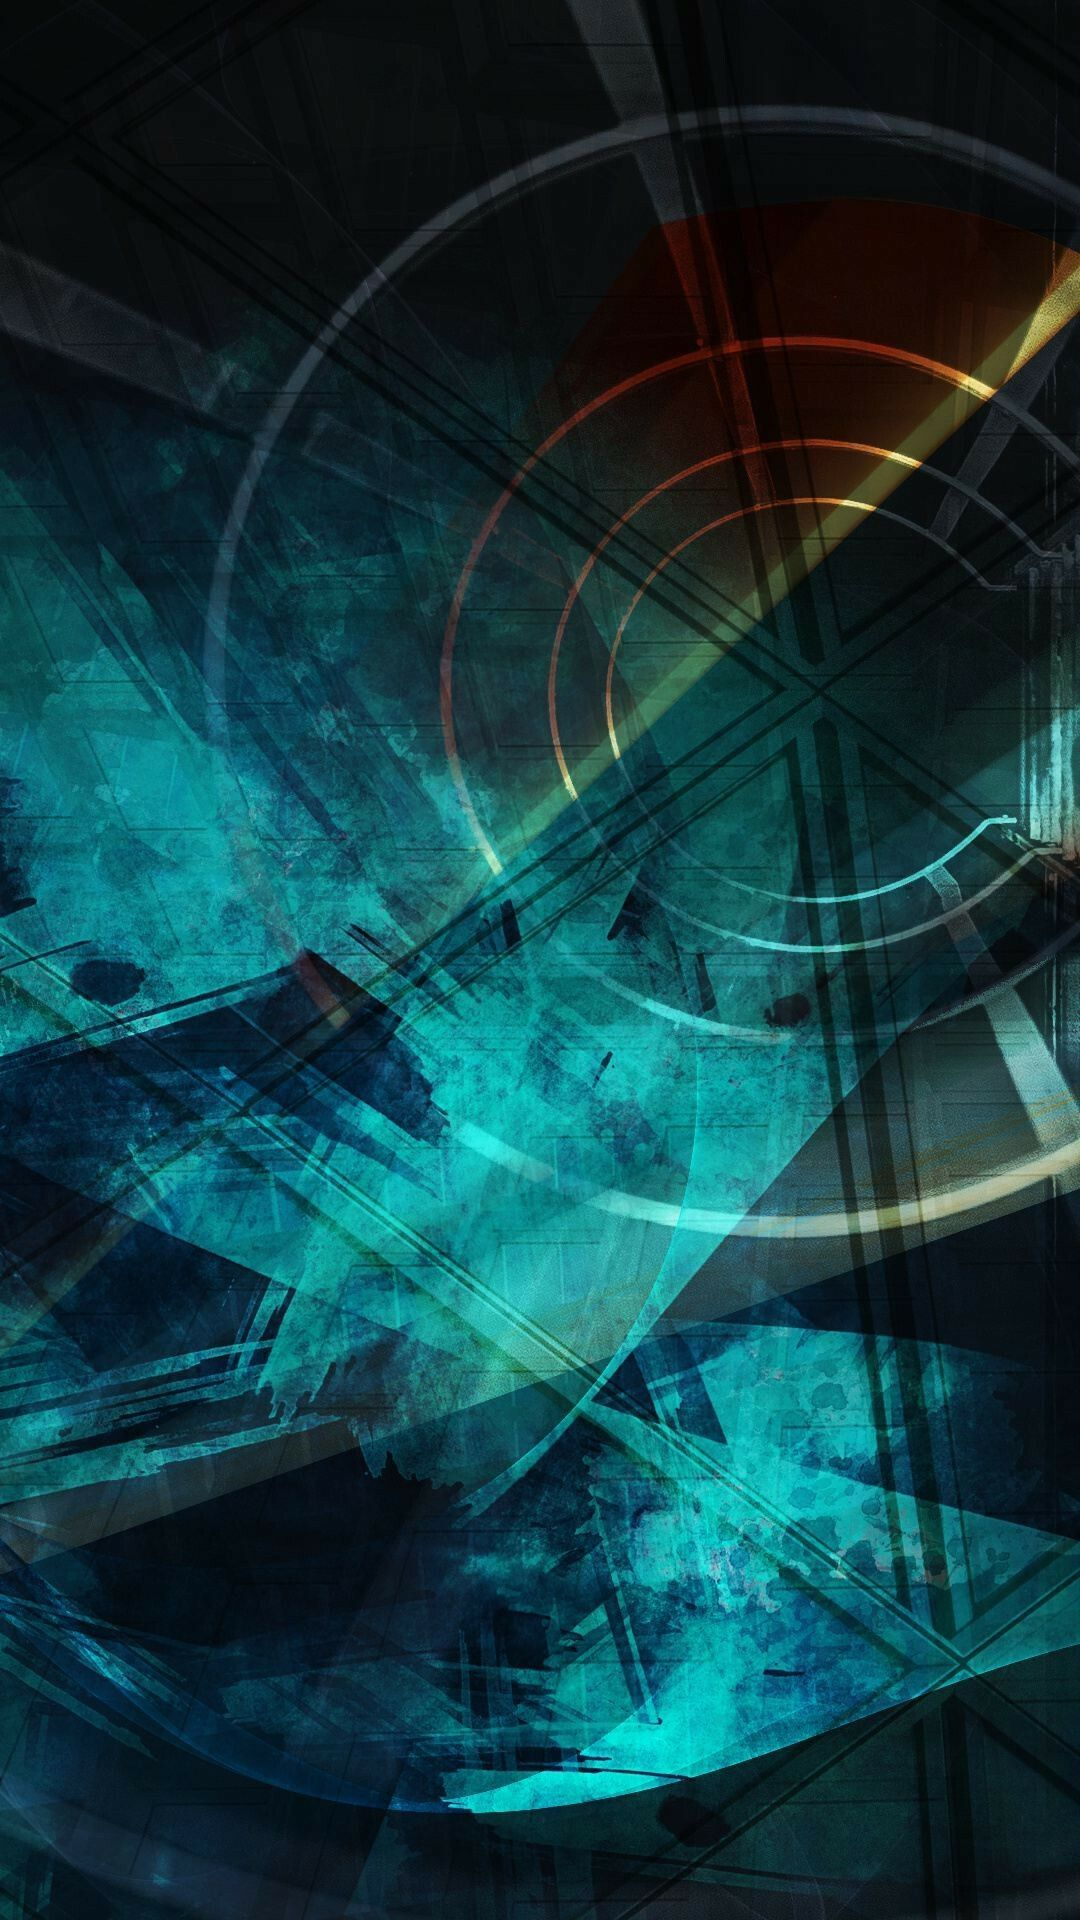 Blue, Turquoise, Aqua, Graphic design, Teal, Pattern